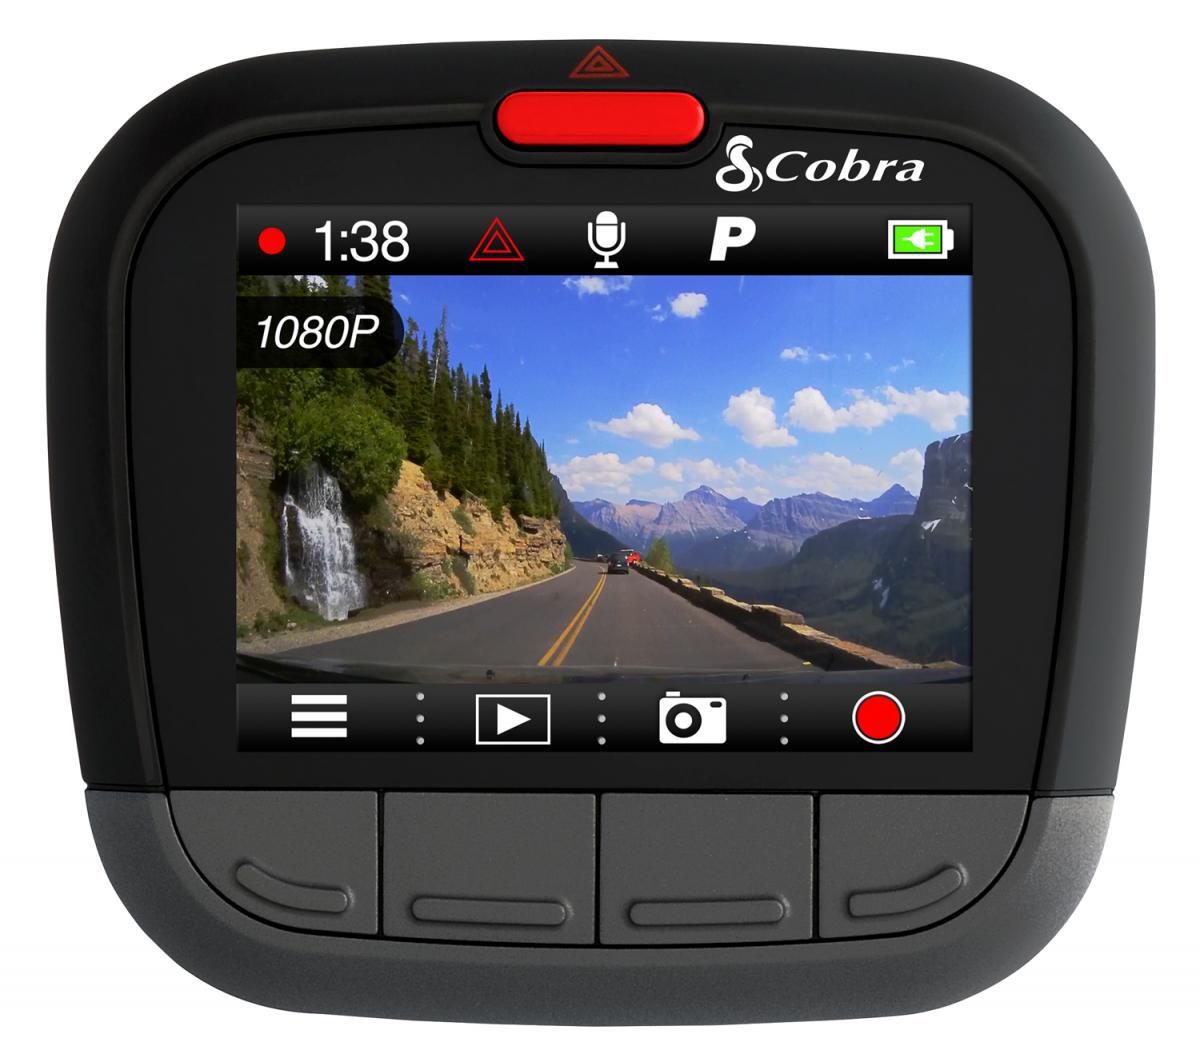 Cobra dashcam with built-in GPS debuts at MATS